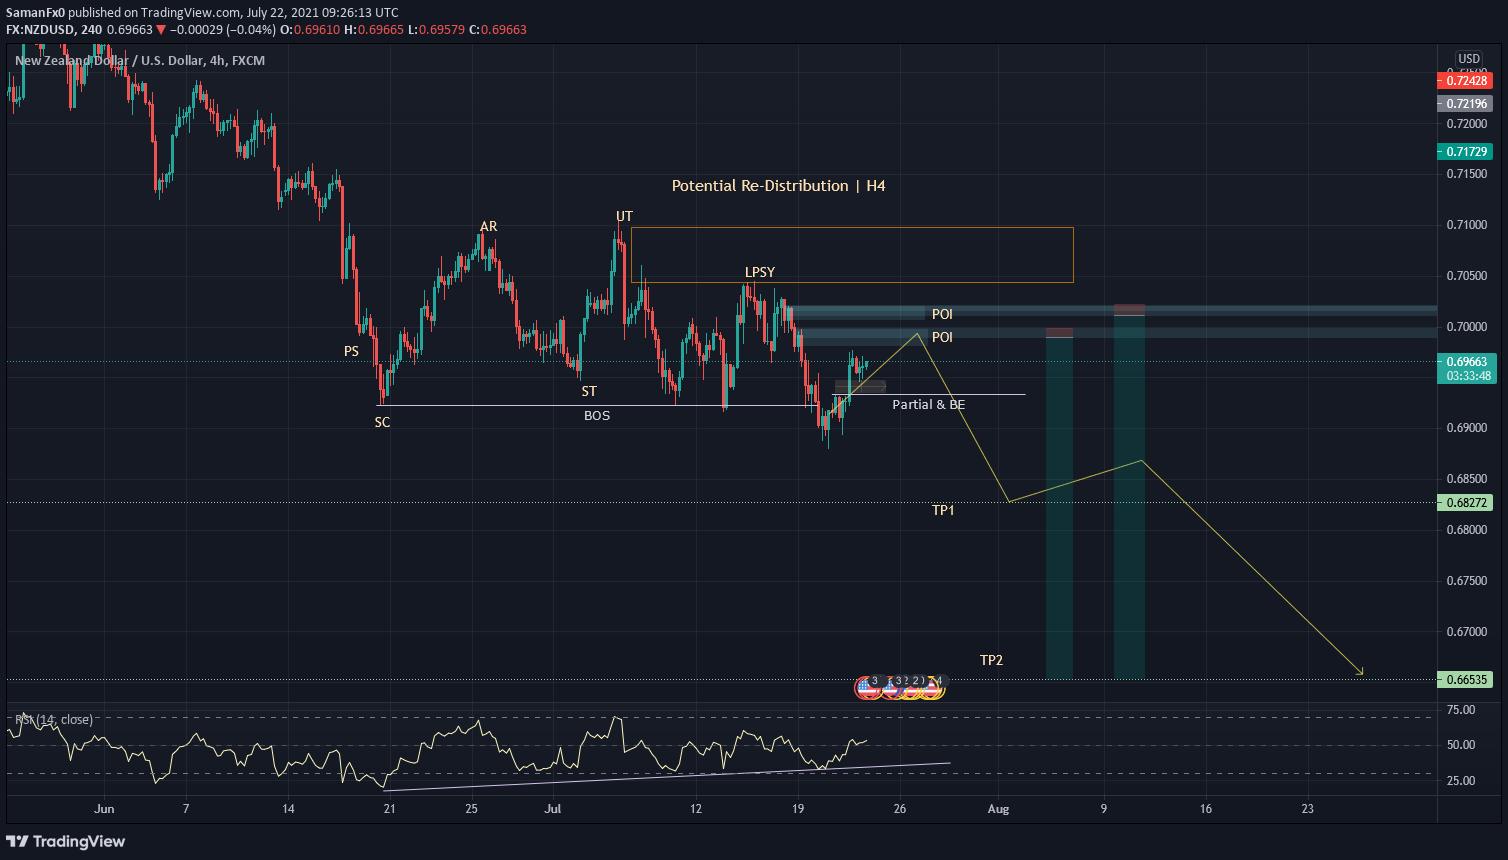 NZD/USD H4 Wyckoff theory